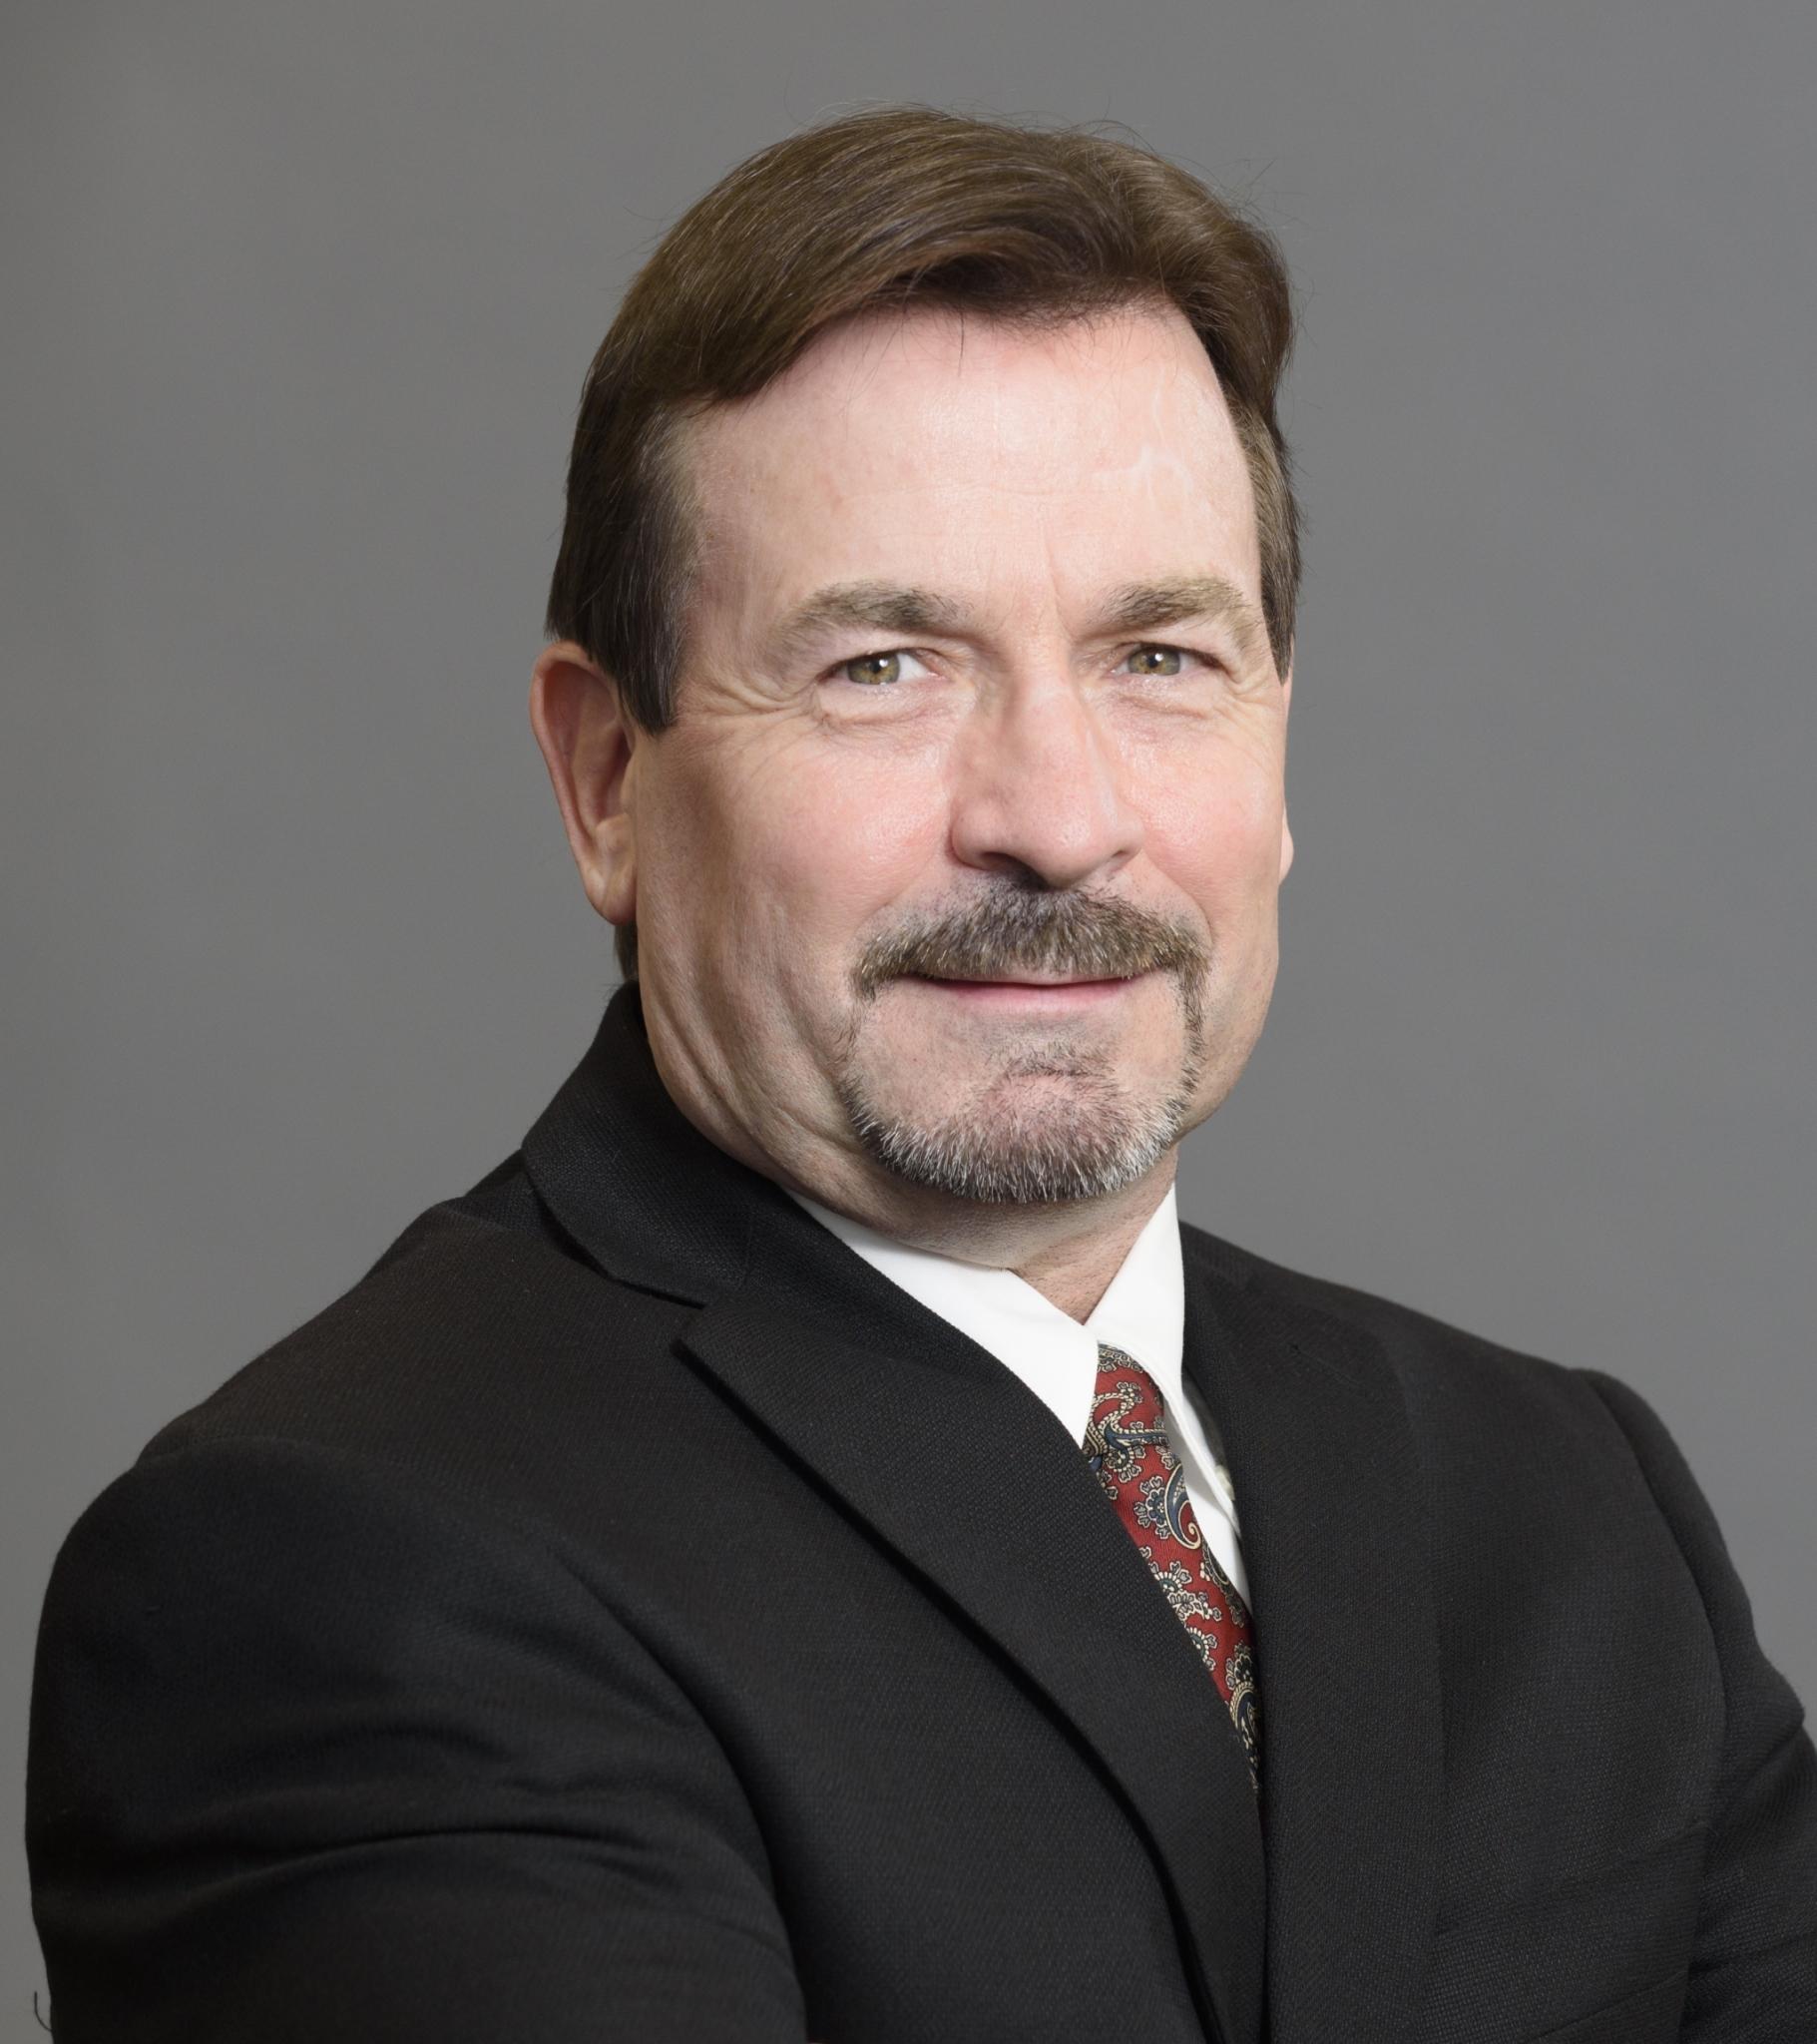 Headshot of Larry Sawatsky, Director of Finance